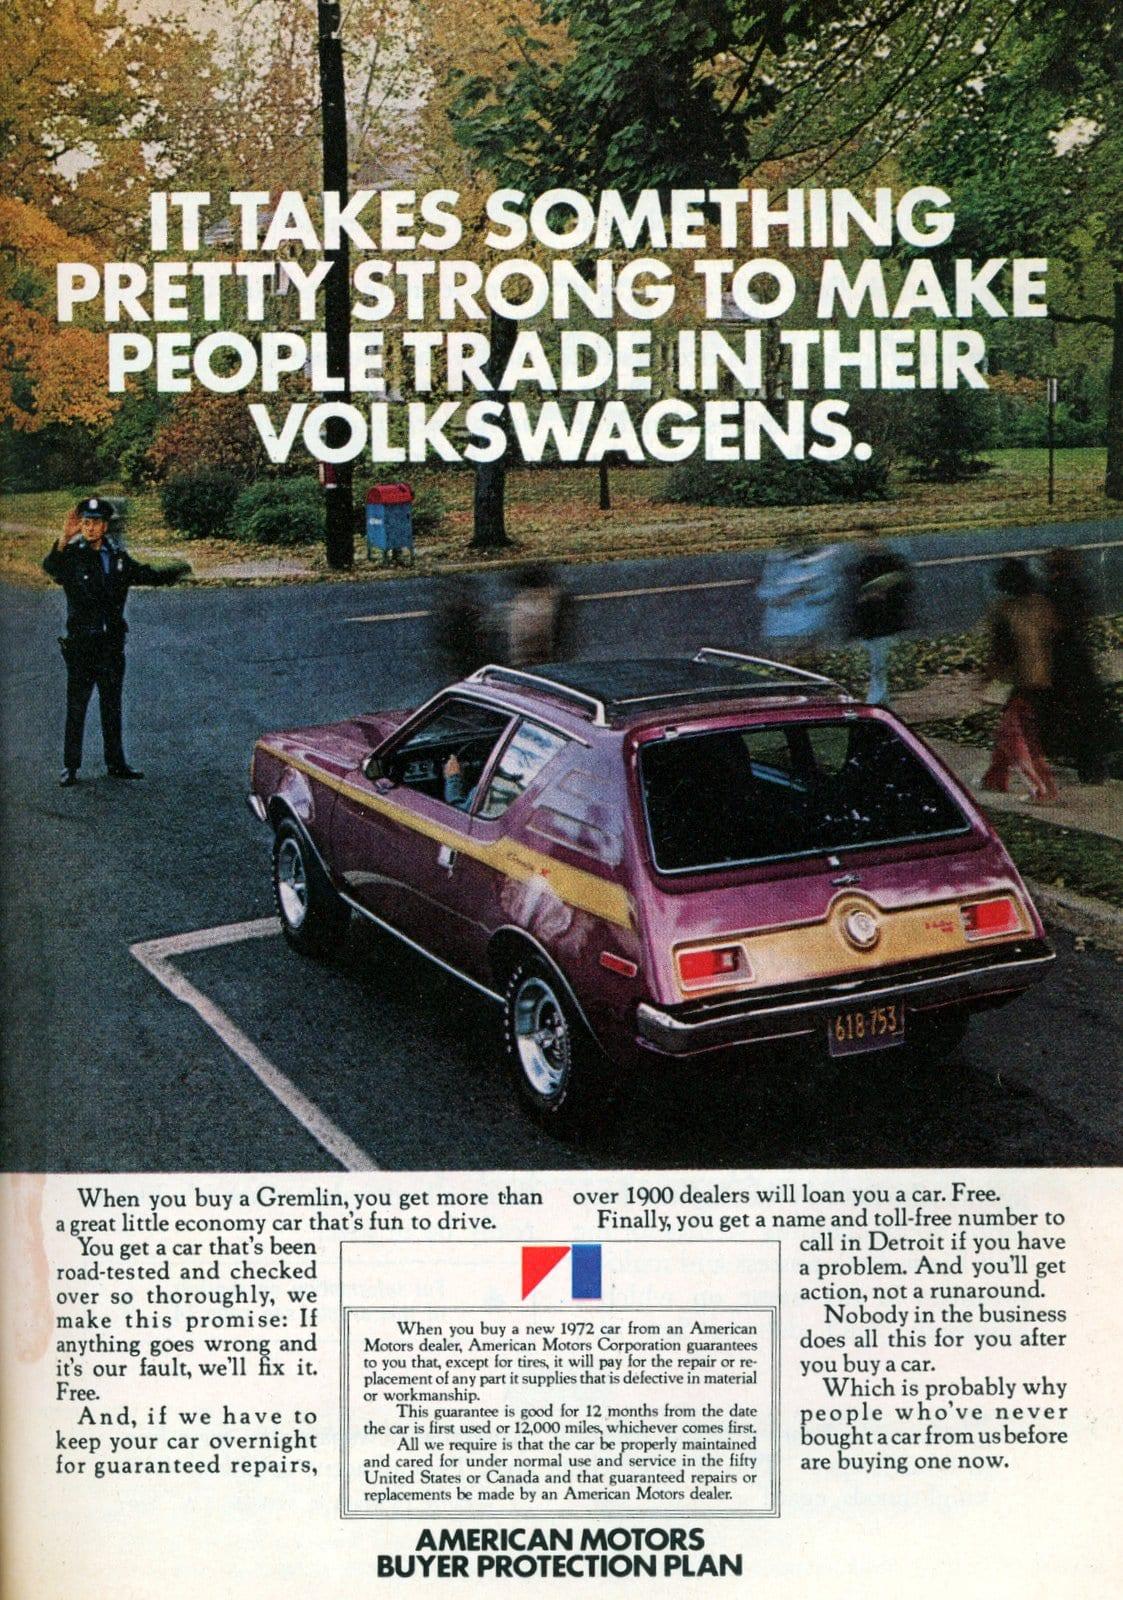 1972 American Motors Gremlin car